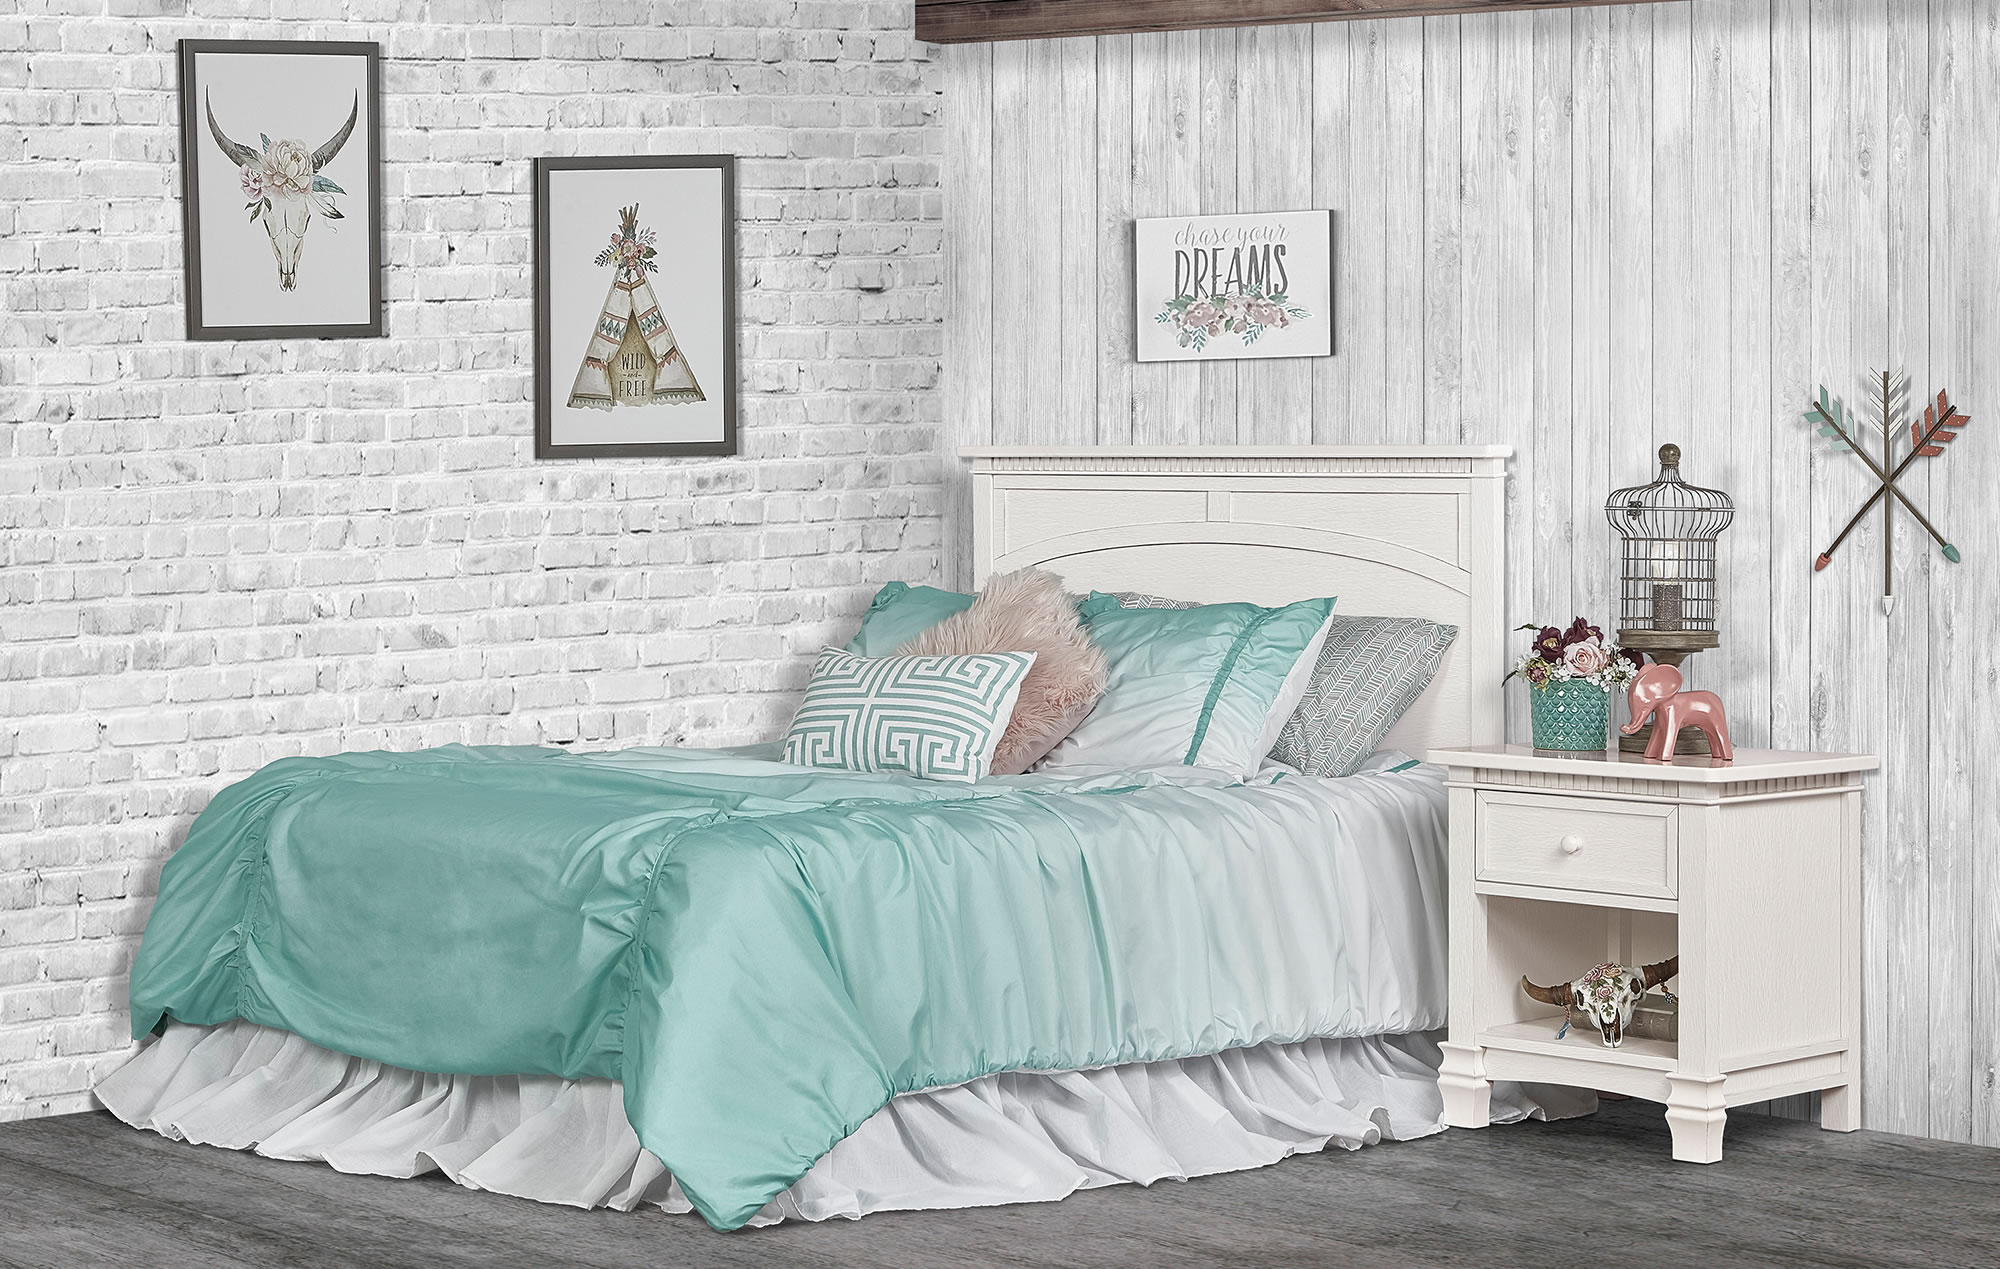 831-DN Santa Fe Full Bed Headfoot RS1